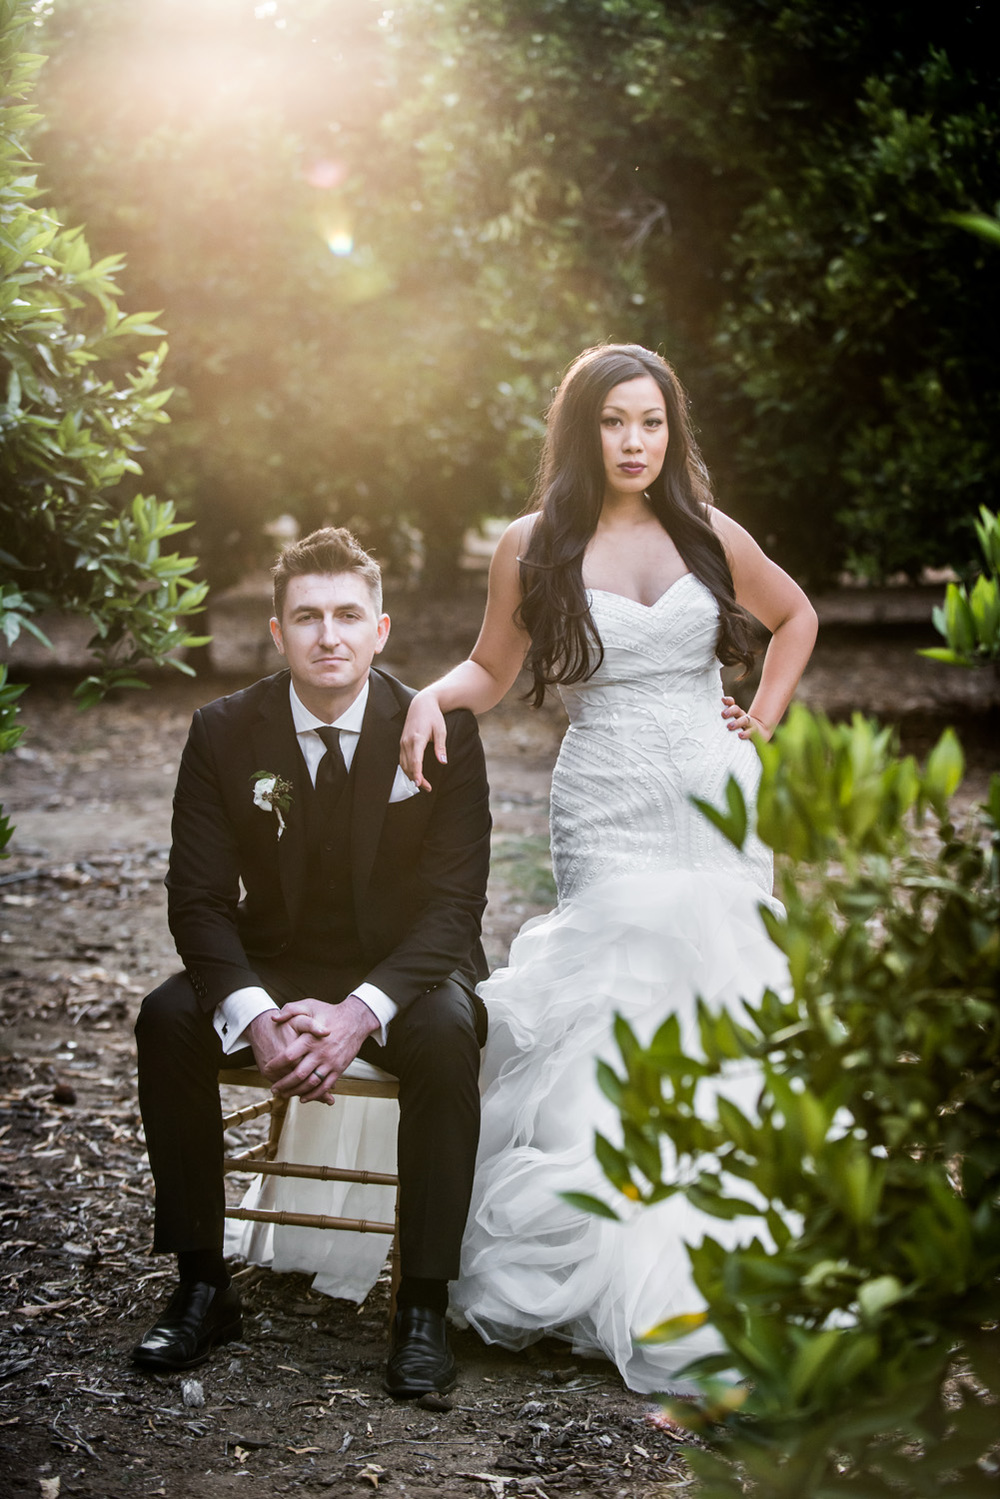 styledshoot_realcouple_orangegroves_prospectpark_weddingdress_anniversarysession